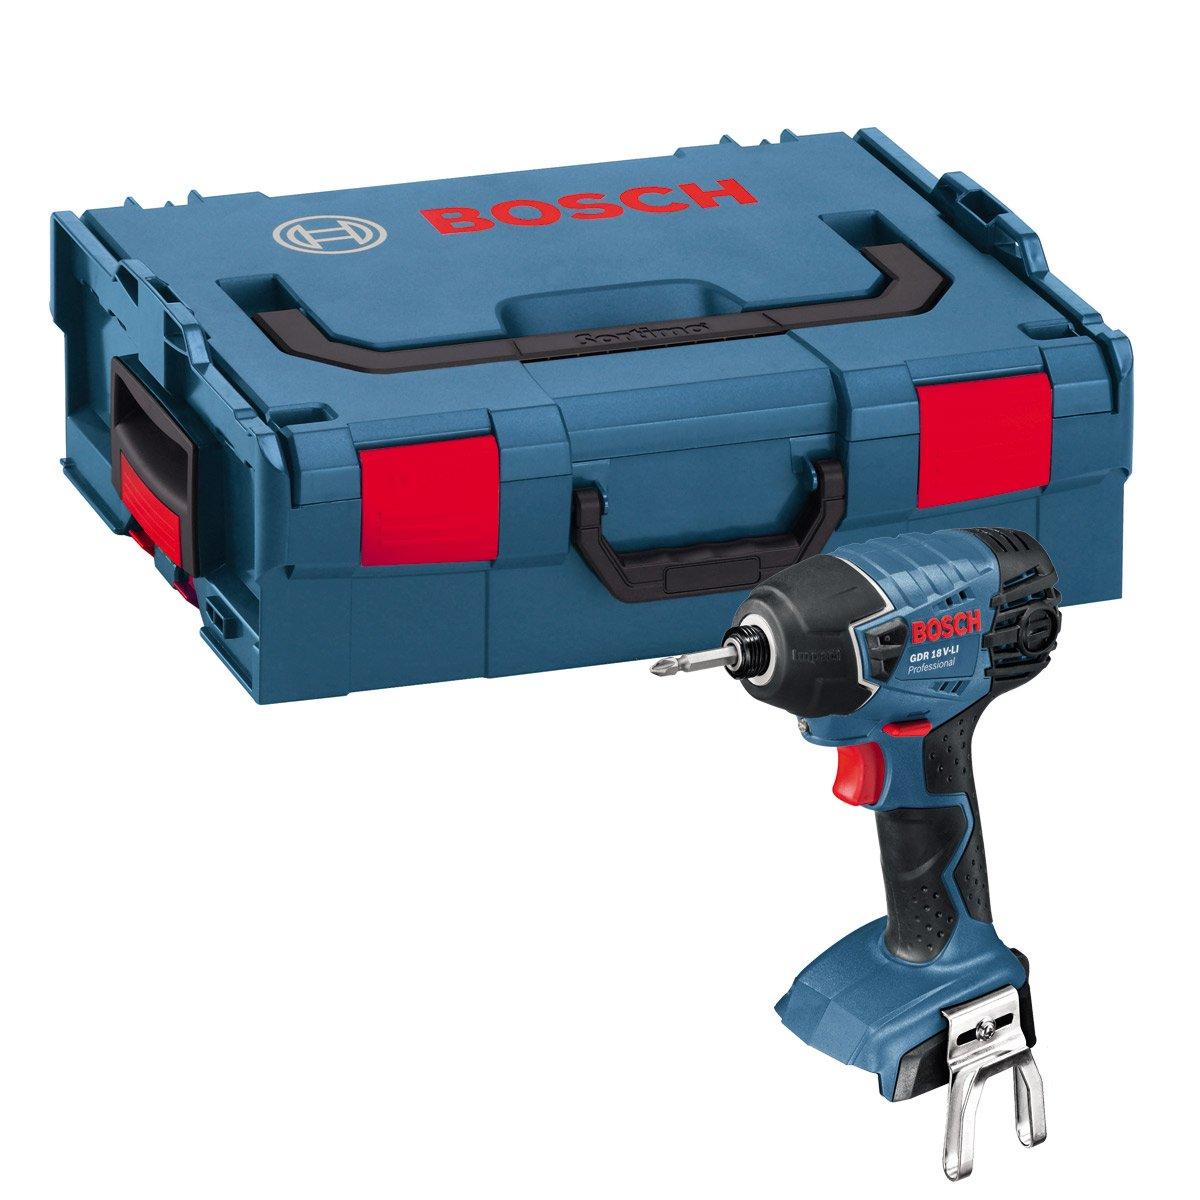 gdr 18v-lin professionel nu + l-boxx Bosch Professional GDR18VLINCG